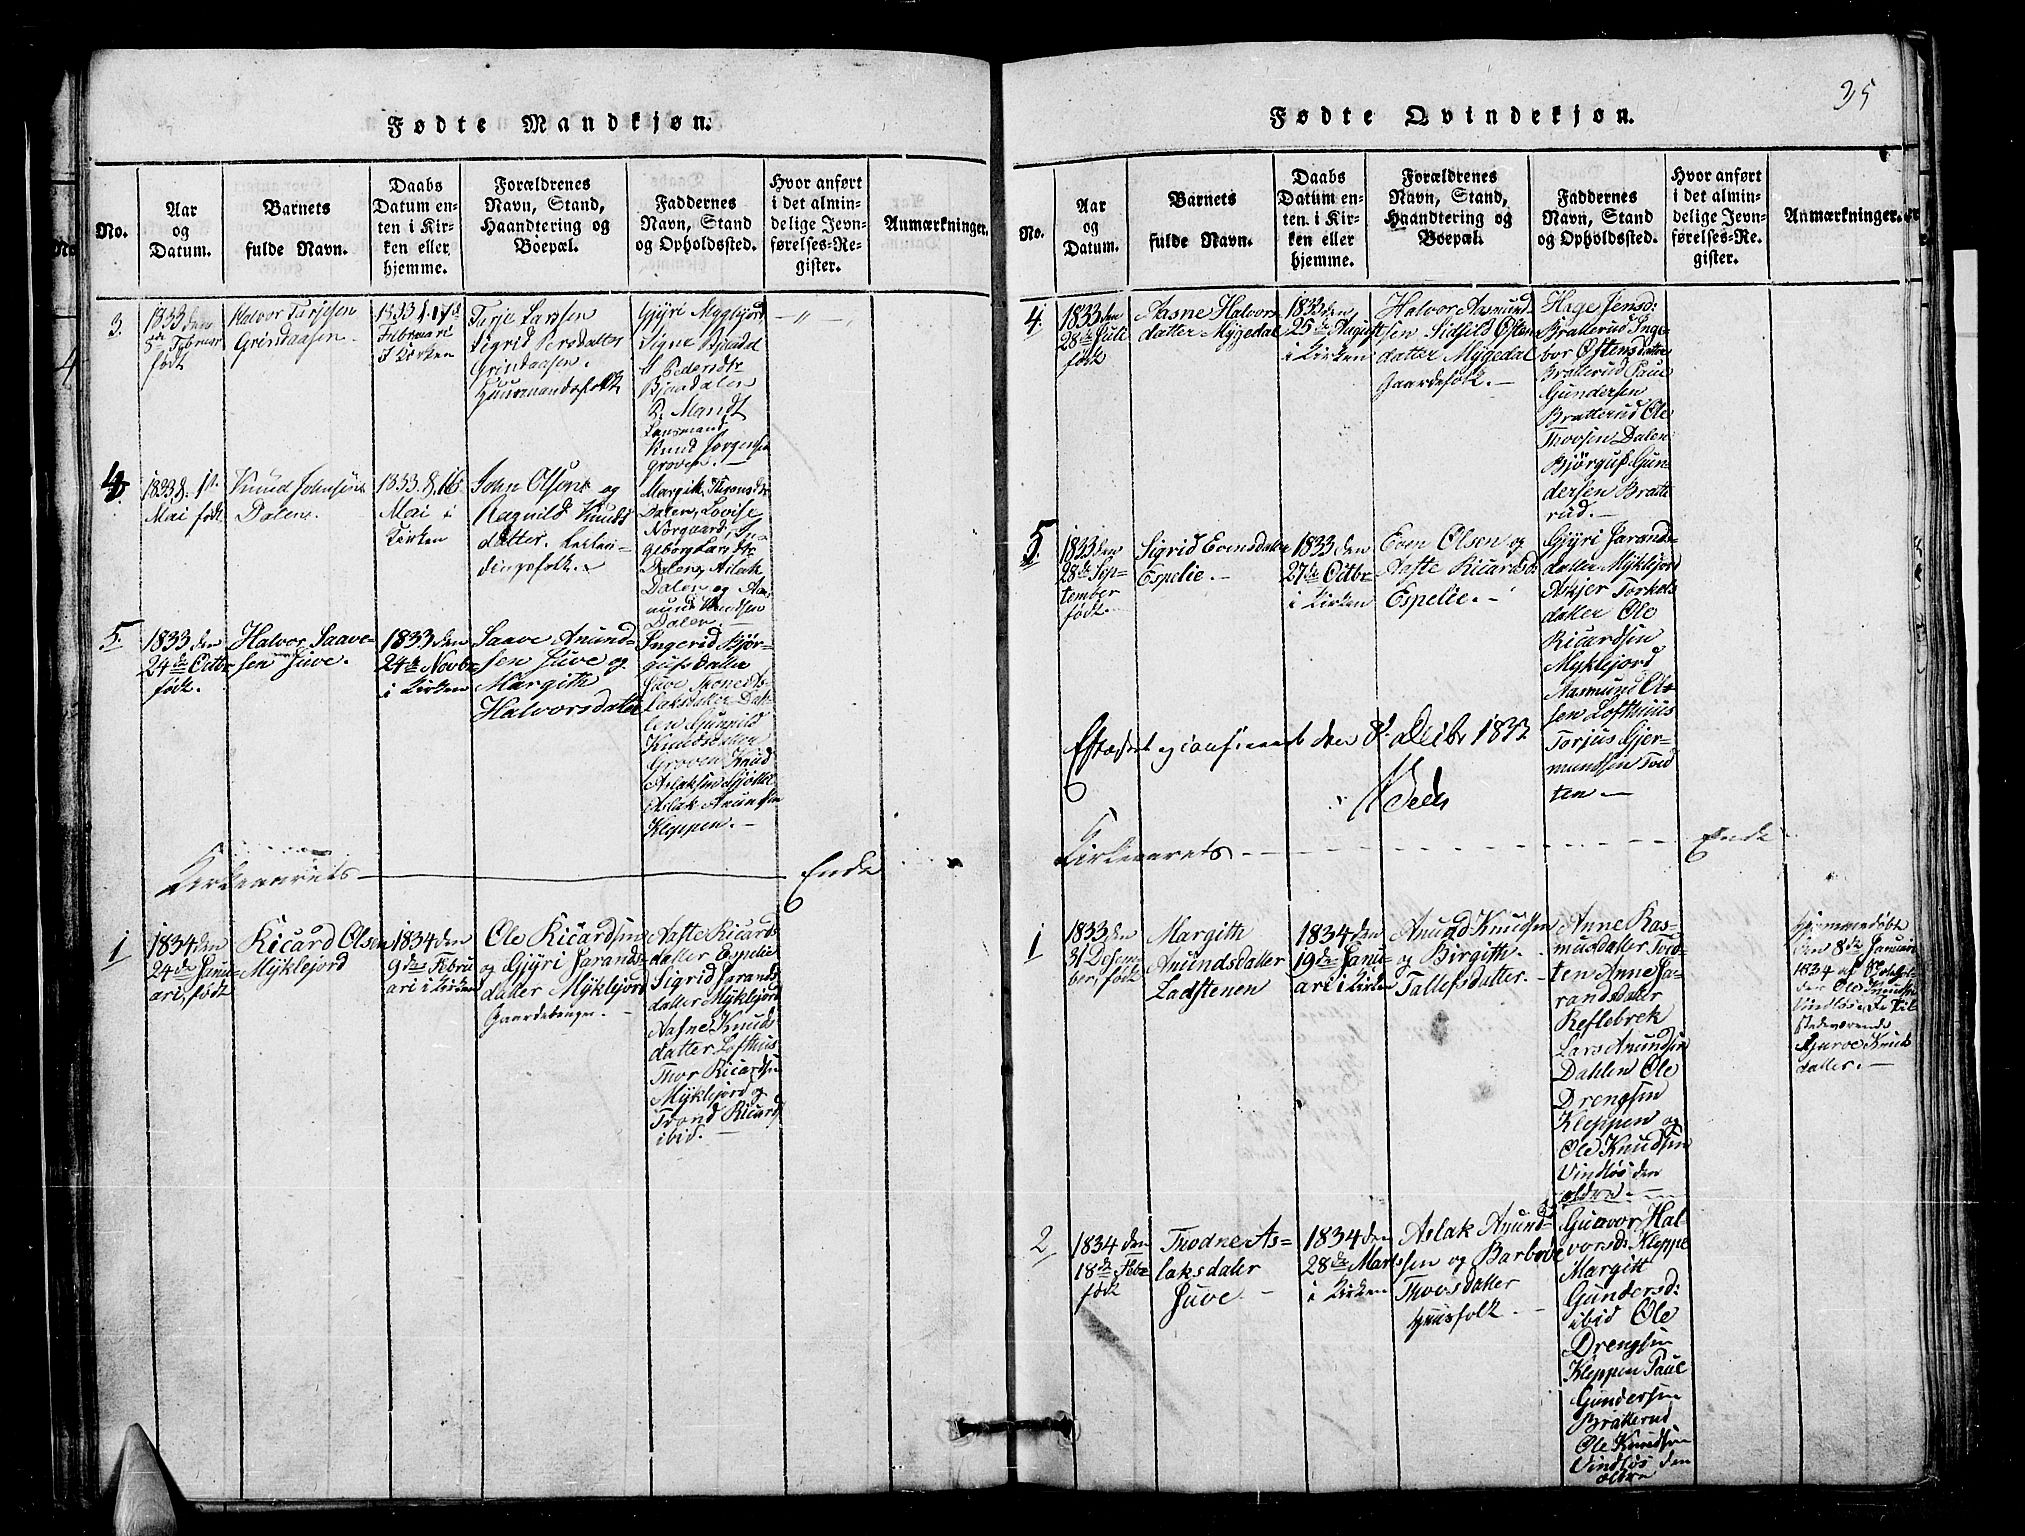 SAKO, Lårdal kirkebøker, G/Gb/L0001: Klokkerbok nr. II 1, 1815-1865, s. 35